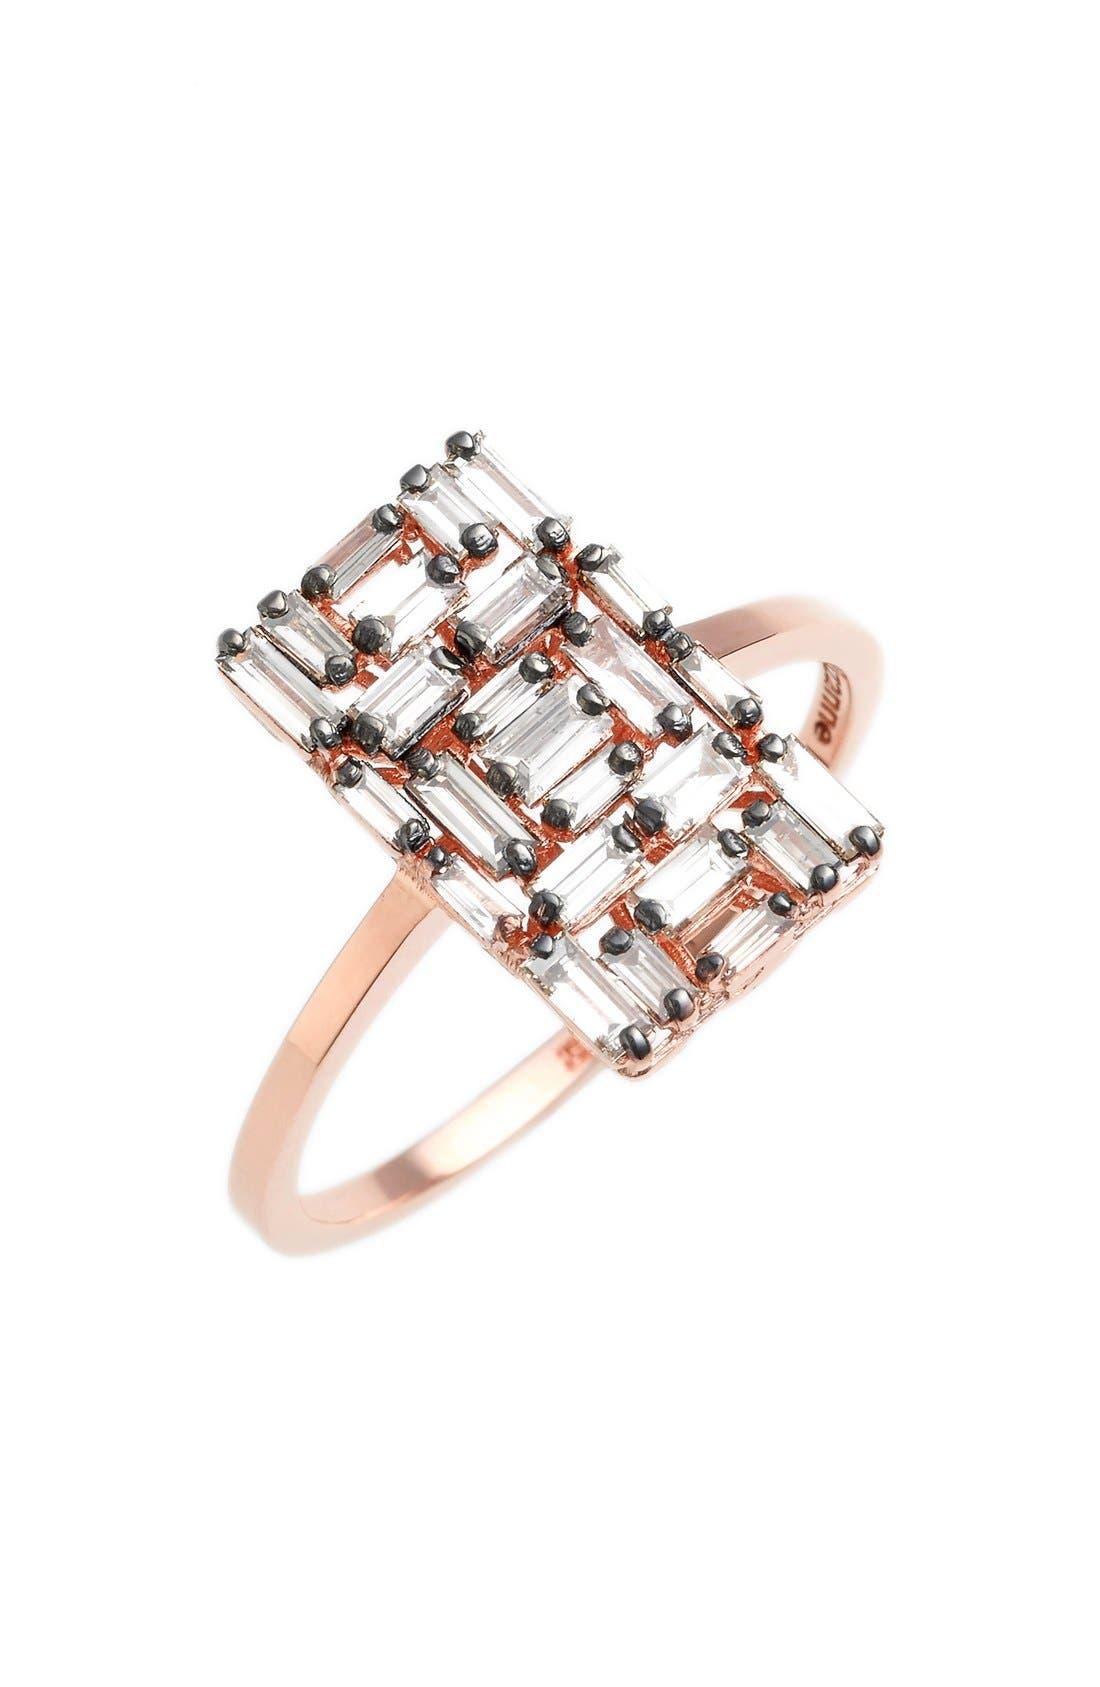 Suzanne Kalan 'Fireworks' Rectangular Baguette Diamond Ring